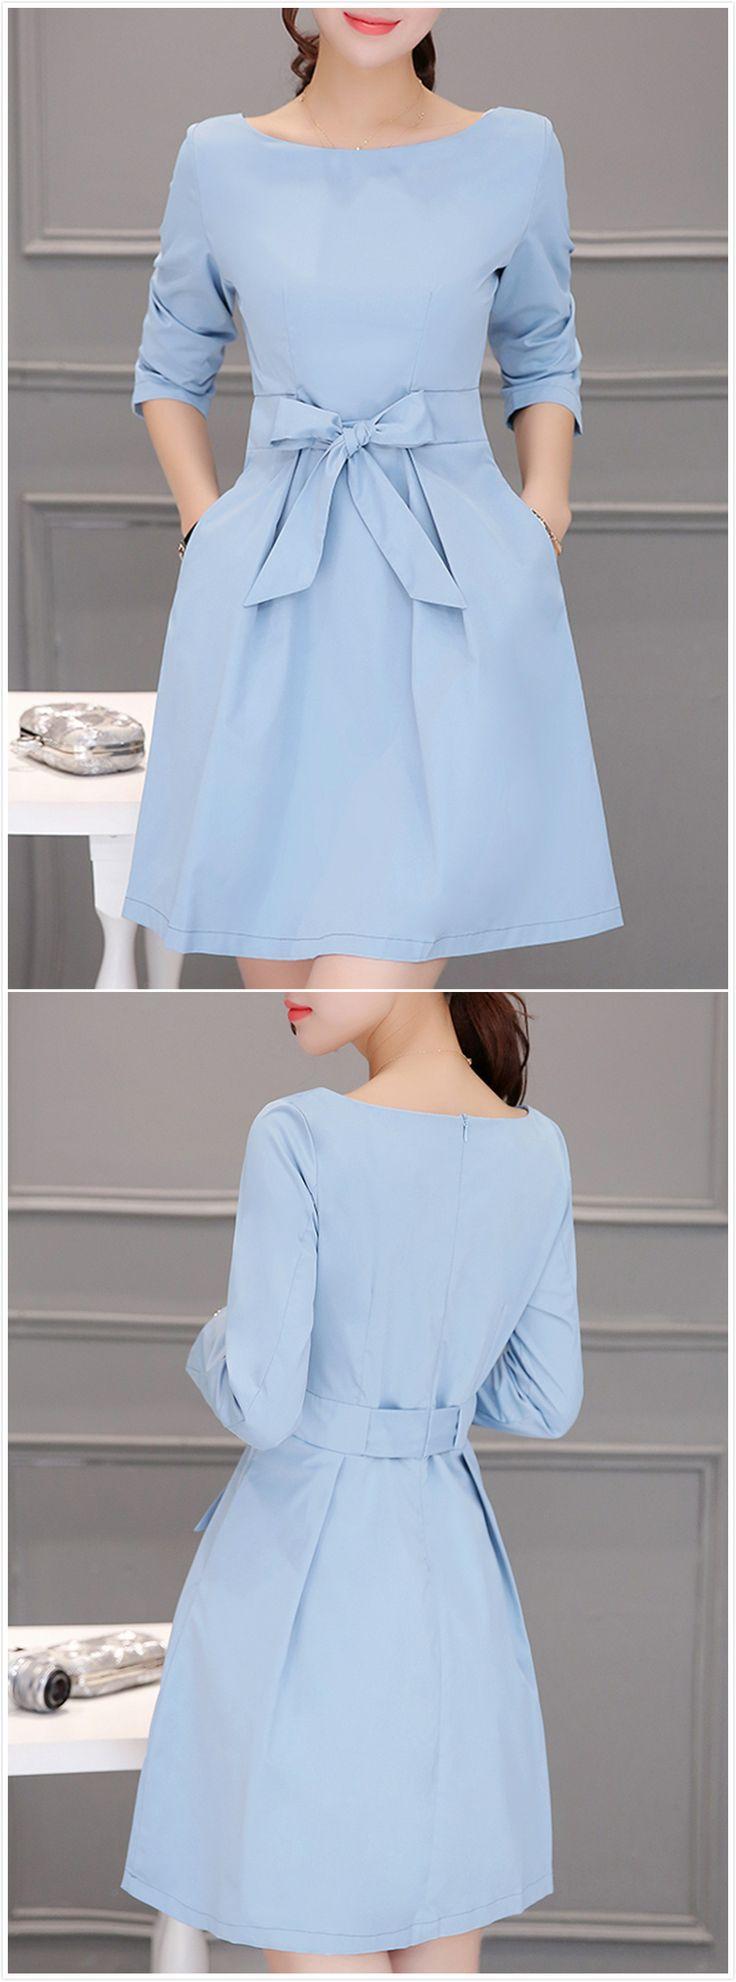 Serenity dresses  Azul claro vestido